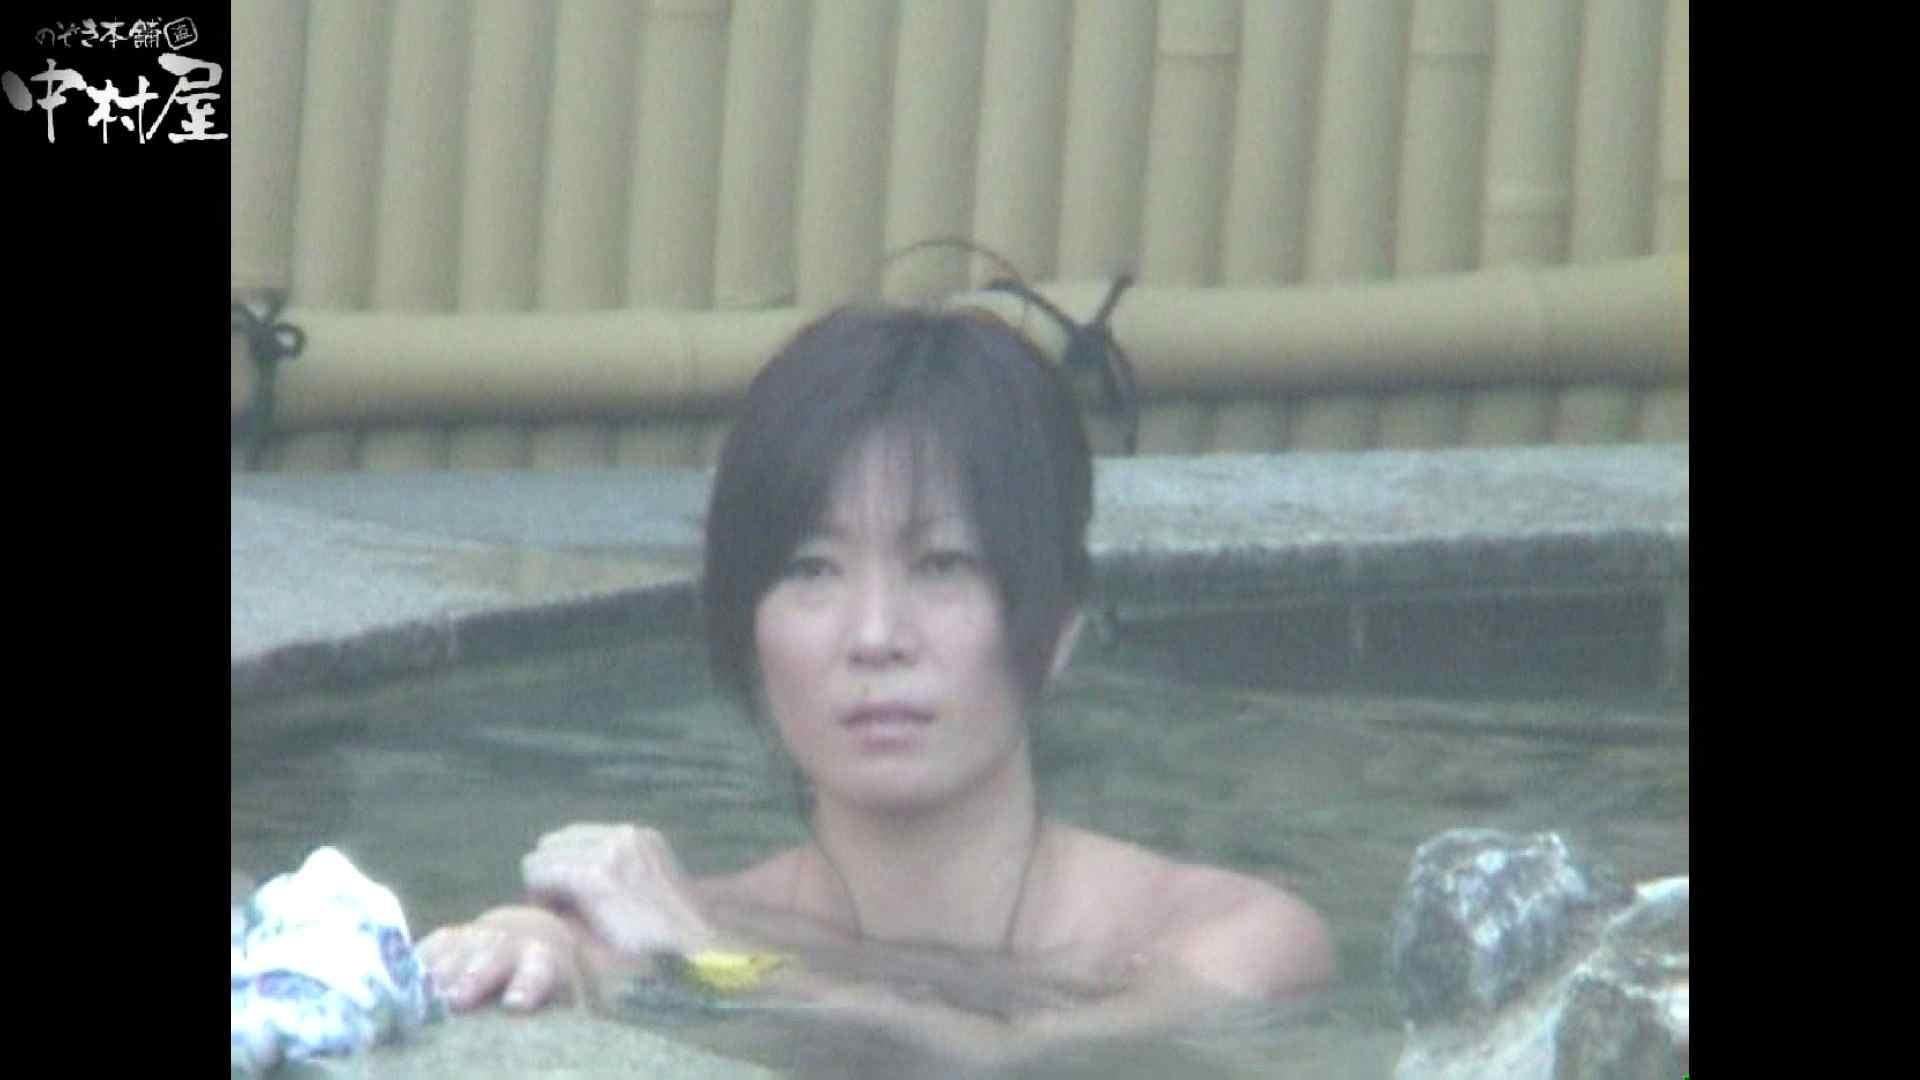 Aquaな露天風呂Vol.972 盗撮 おまんこ動画流出 80画像 62